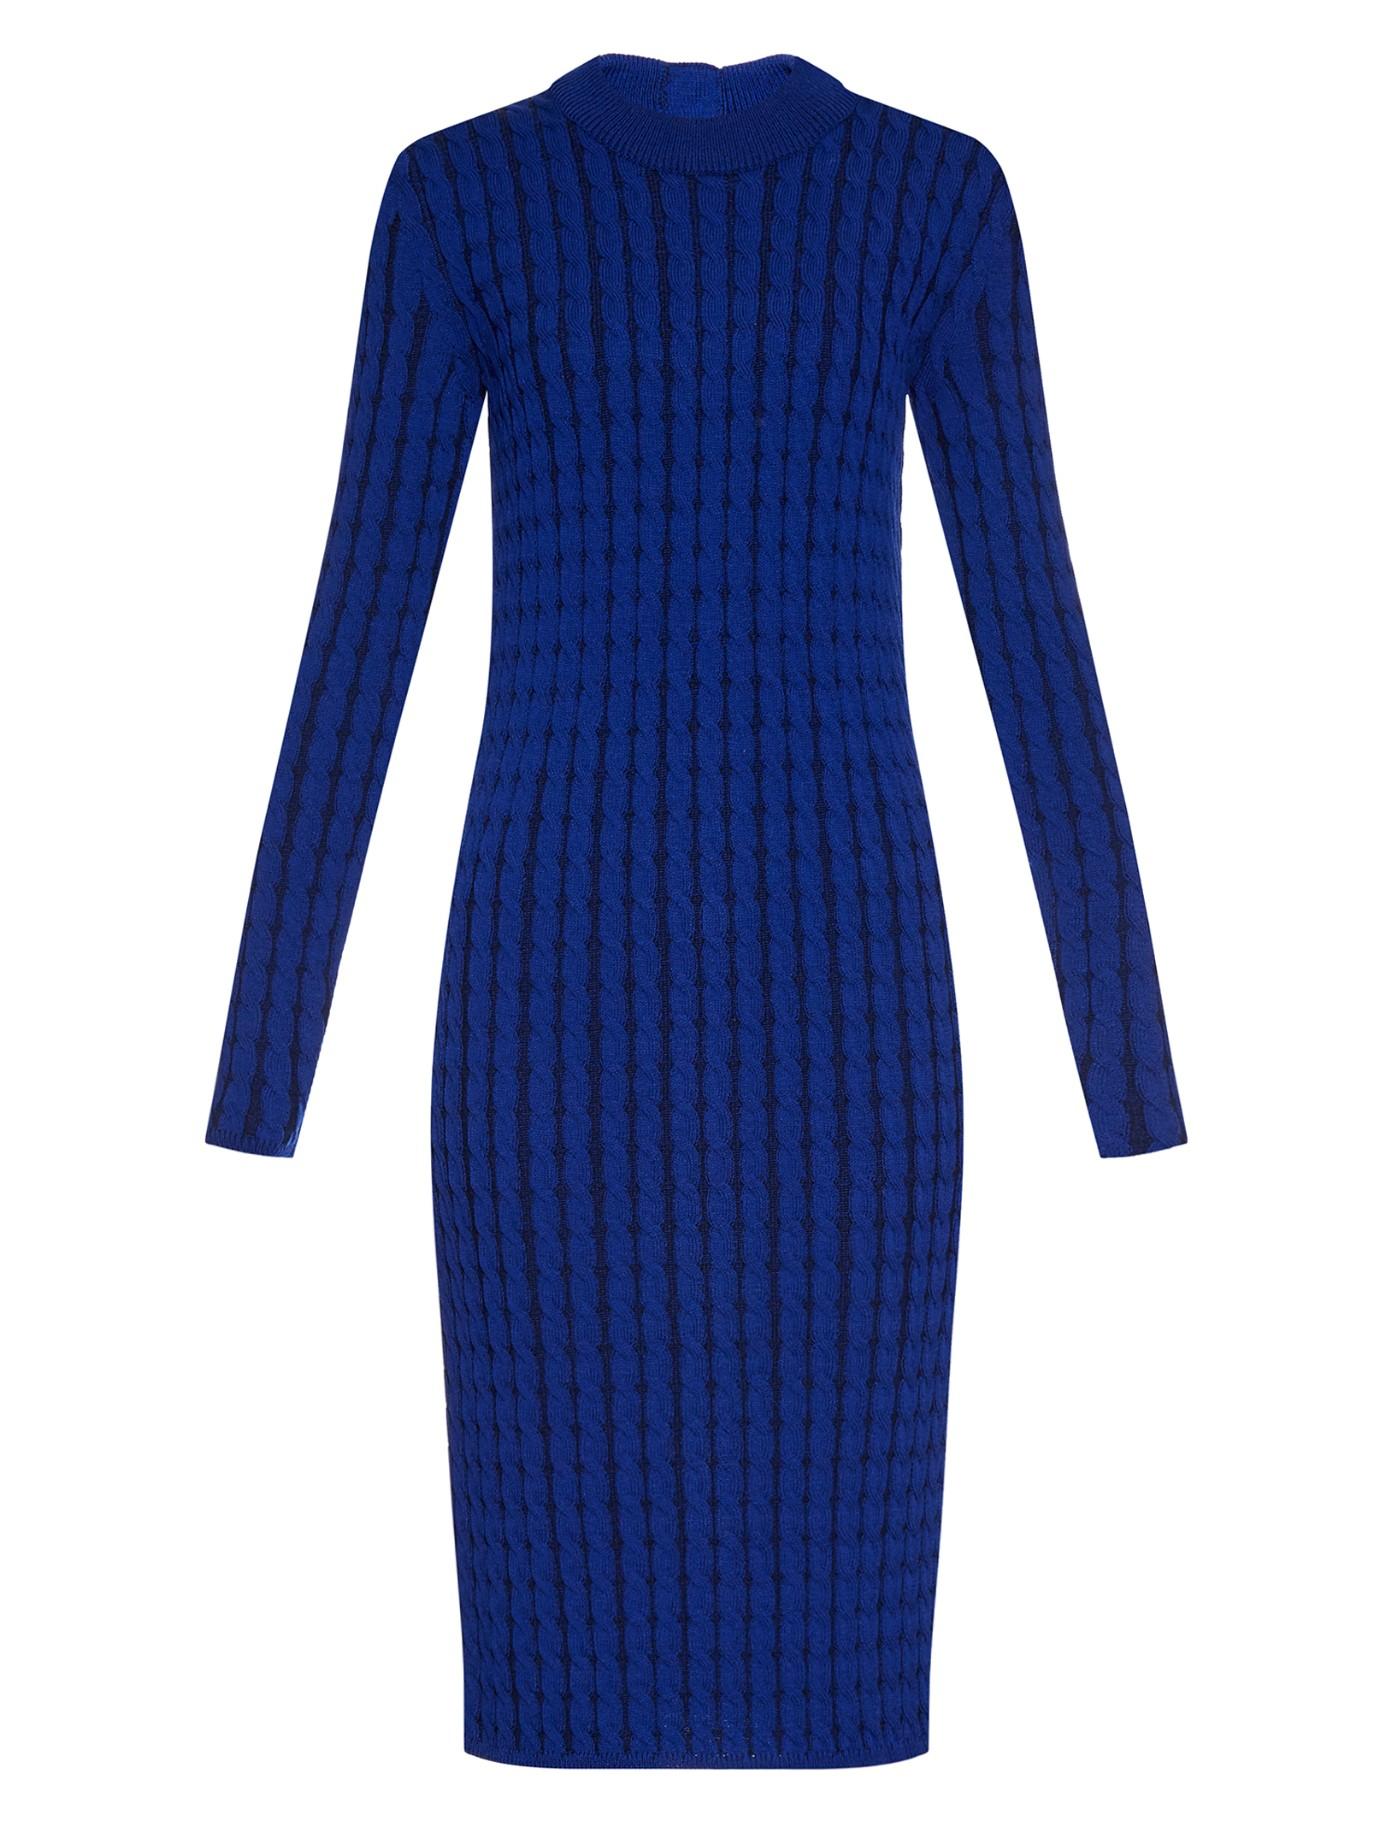 Proenza schouler Cable-knit Wool-blend Dress in Blue Lyst